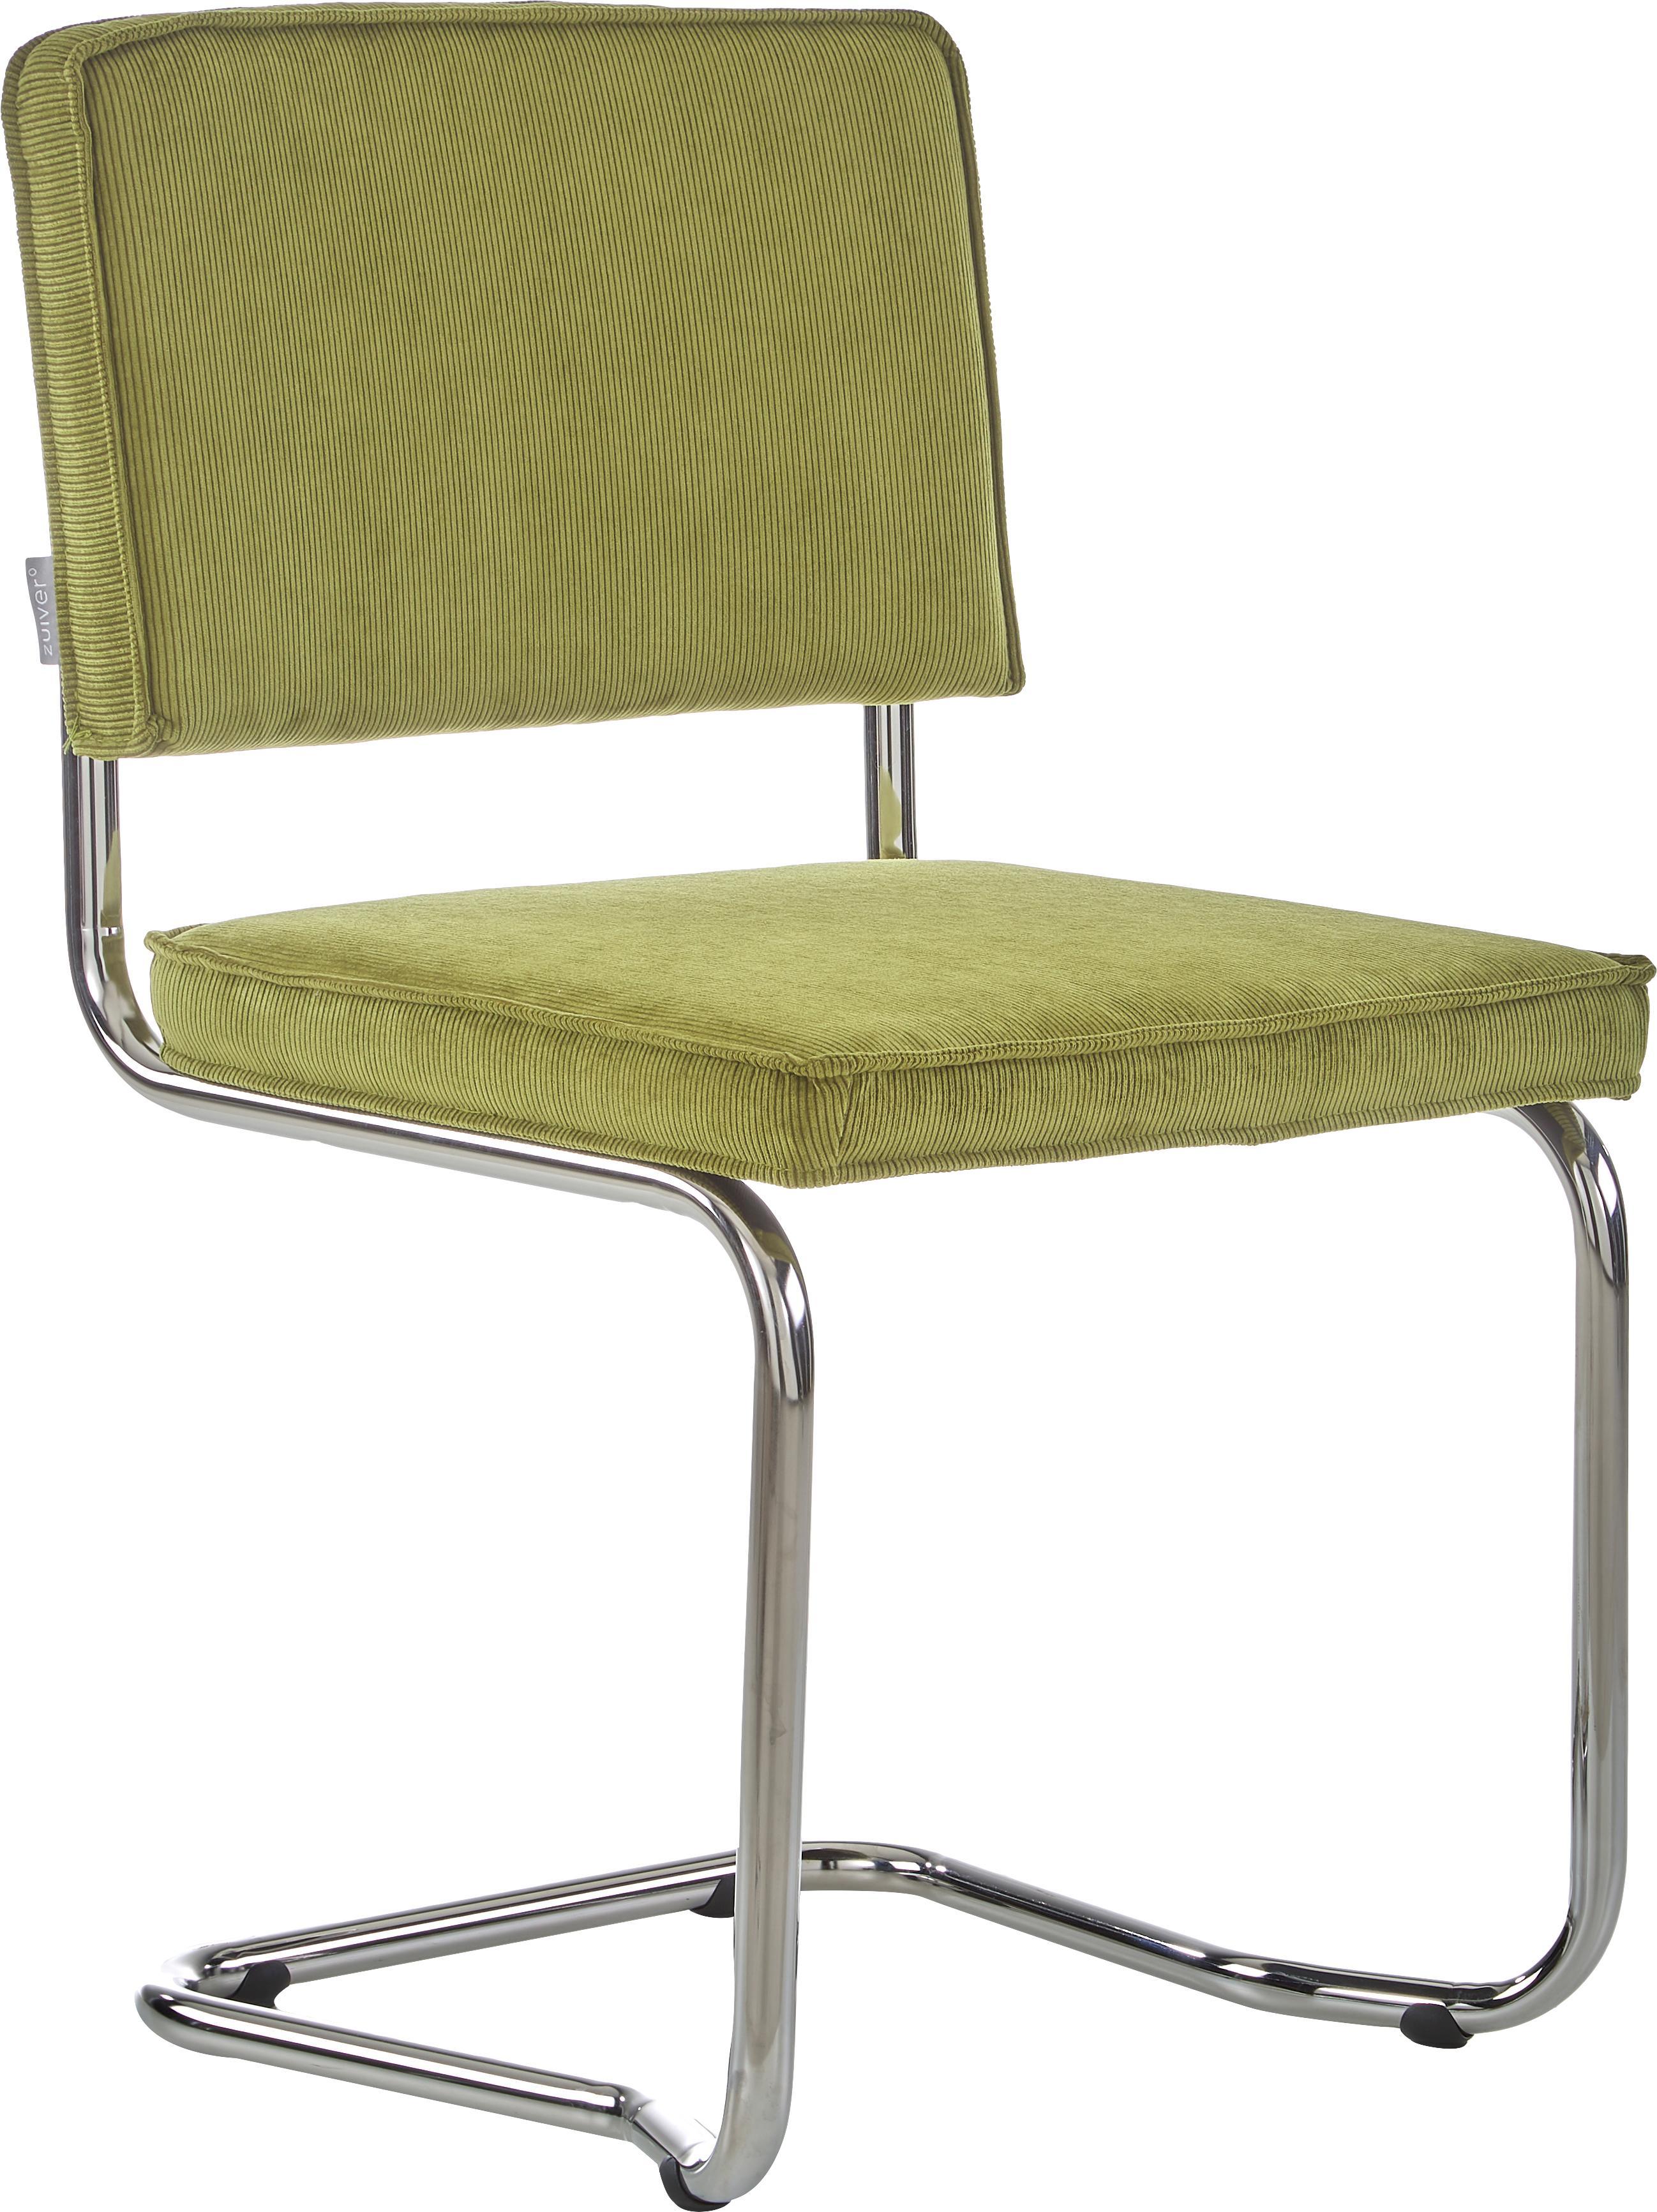 Silla cantilever Ridge Kink Chair, Tapizado: 88%nylon, 12%poliéster, Estructura: metal, cromado El tapizad, Verde, An 48 x Al 85 cm